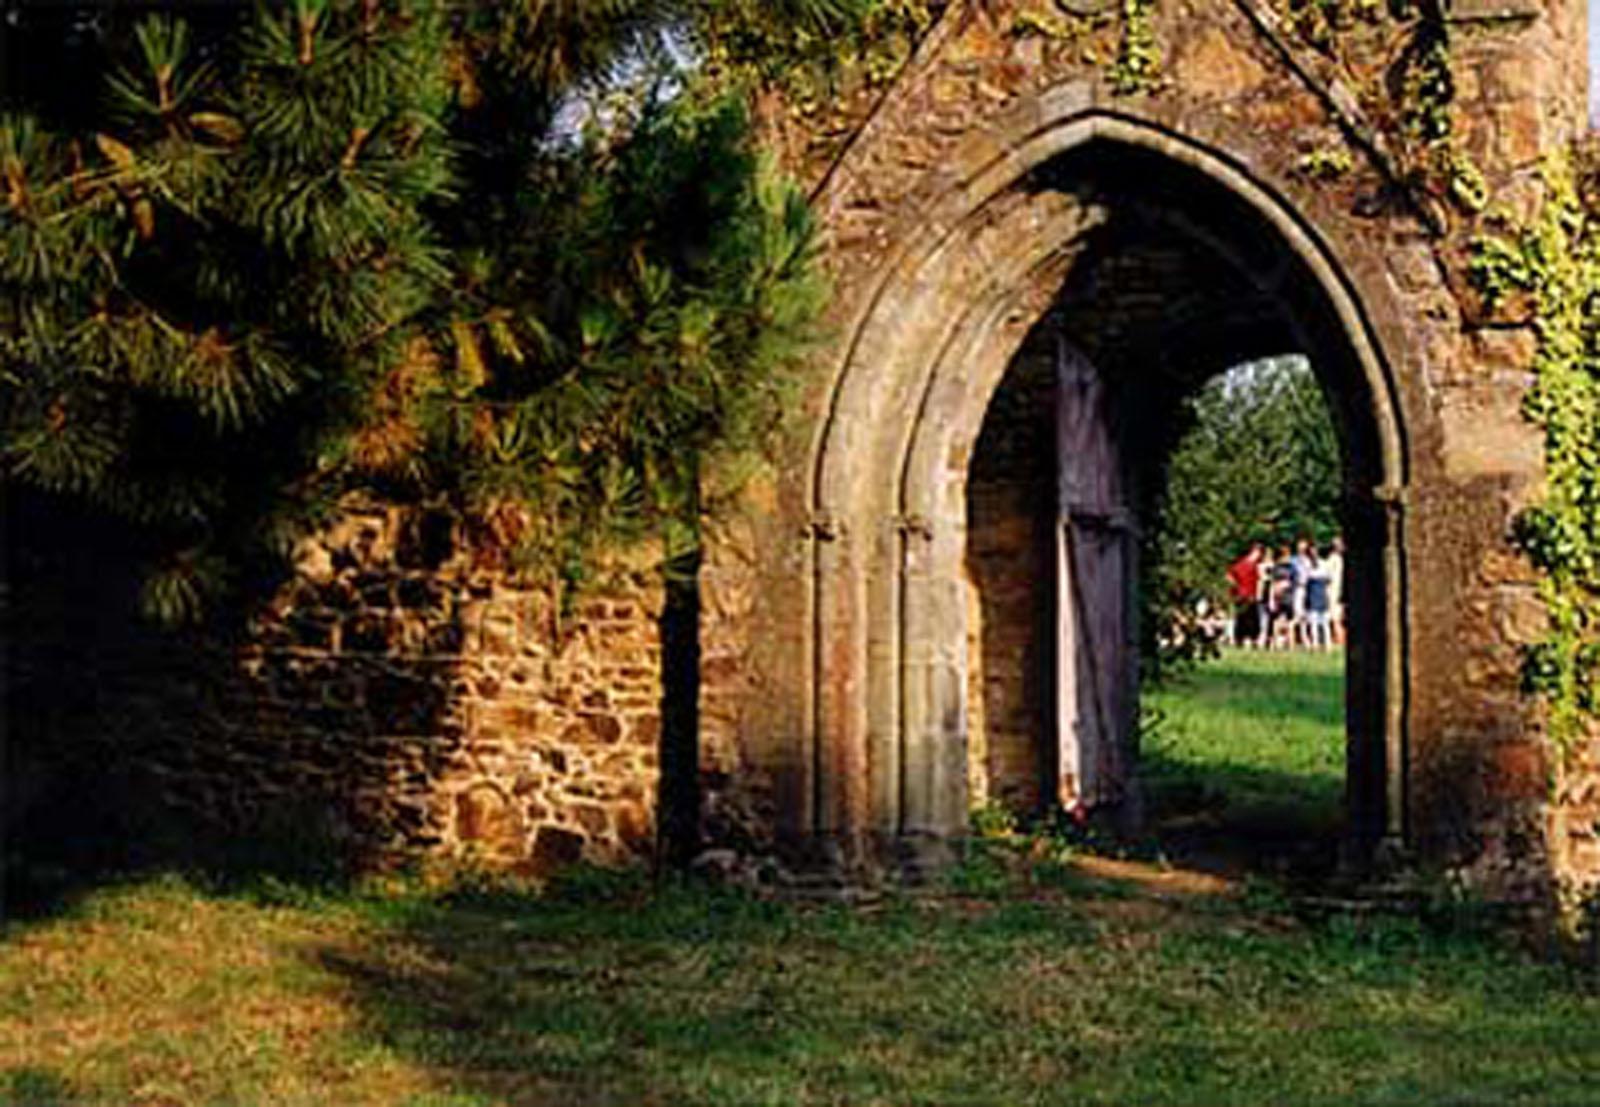 Porte jardin